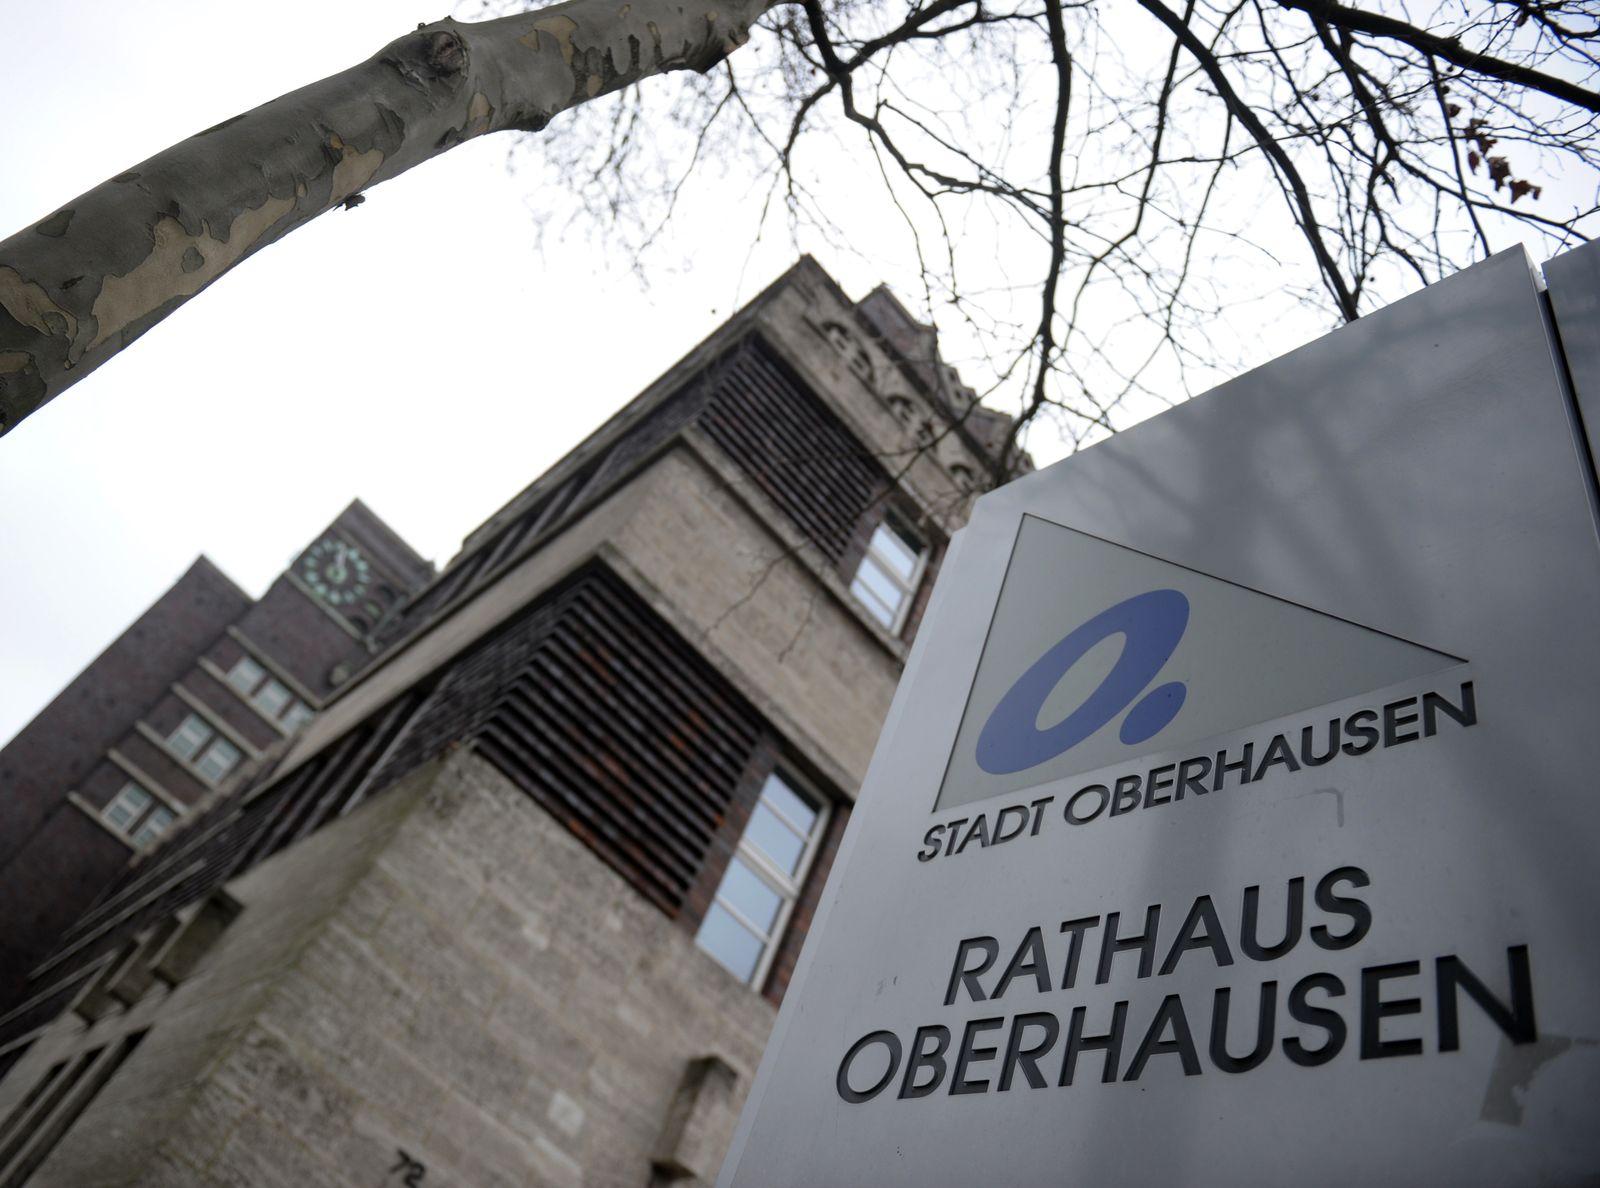 Oberhausen / Tathaus